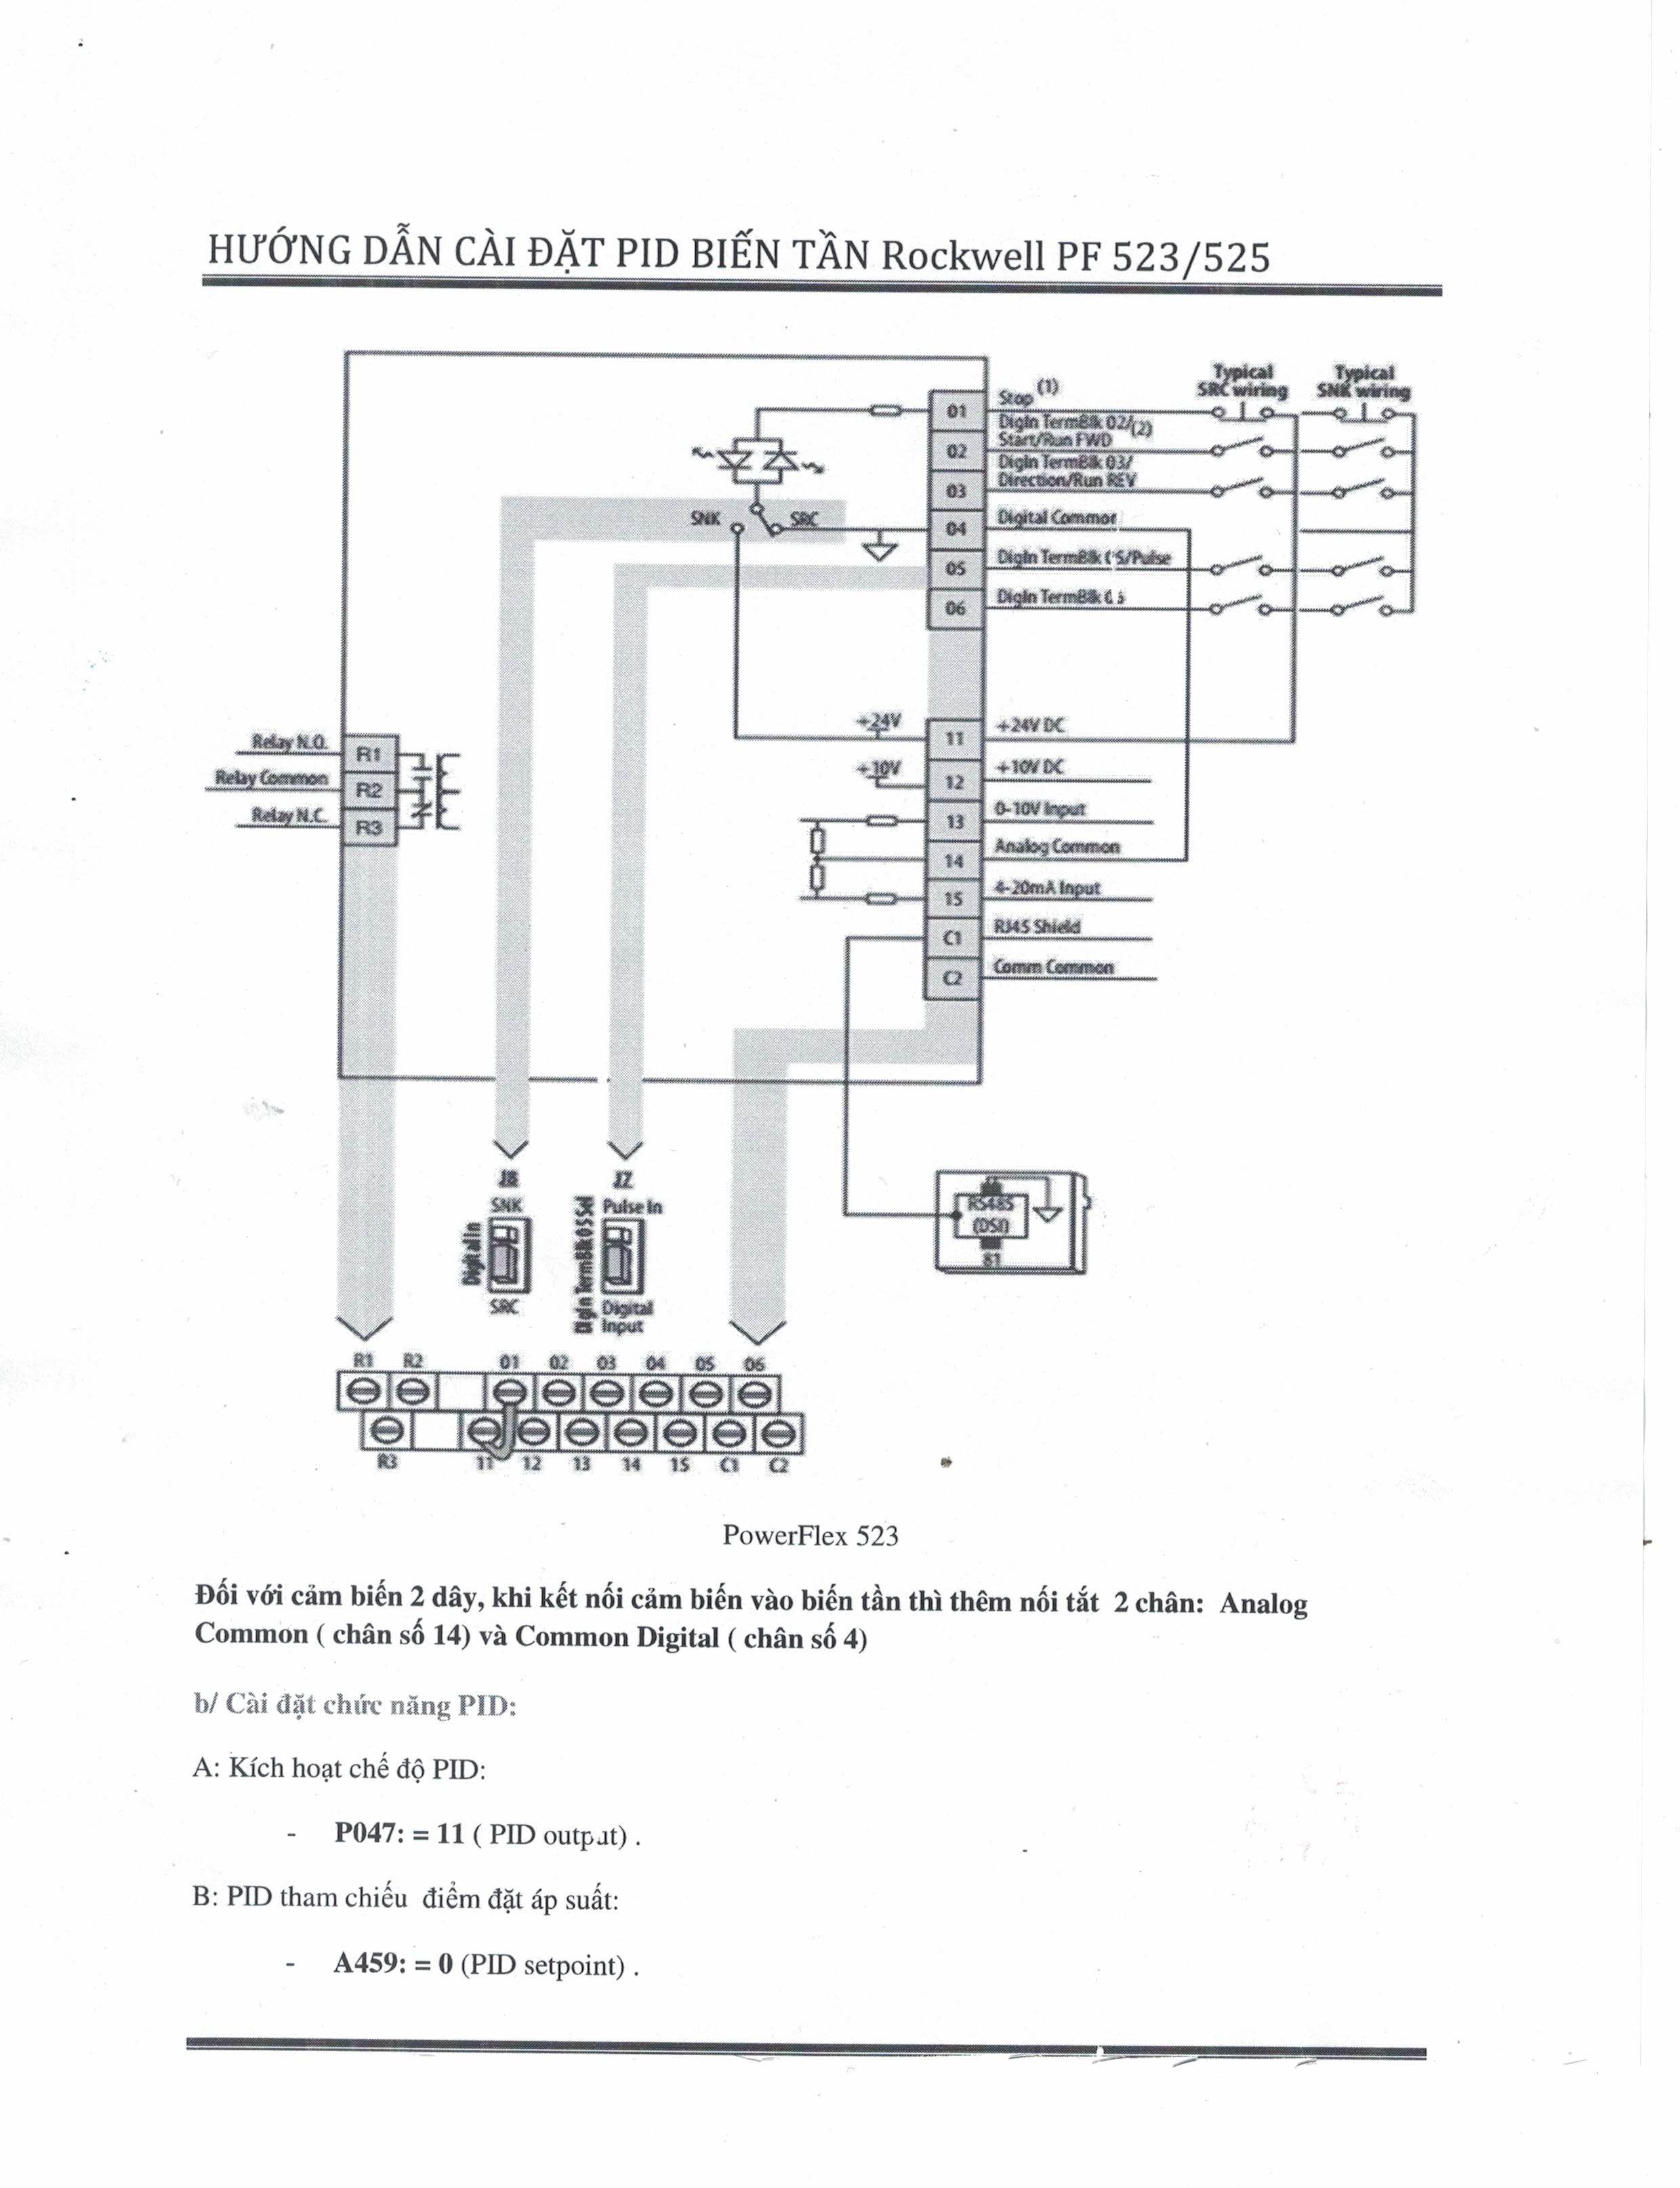 Cài đặt biến tần Rockwell PowerFlex 523 Power Flex 525